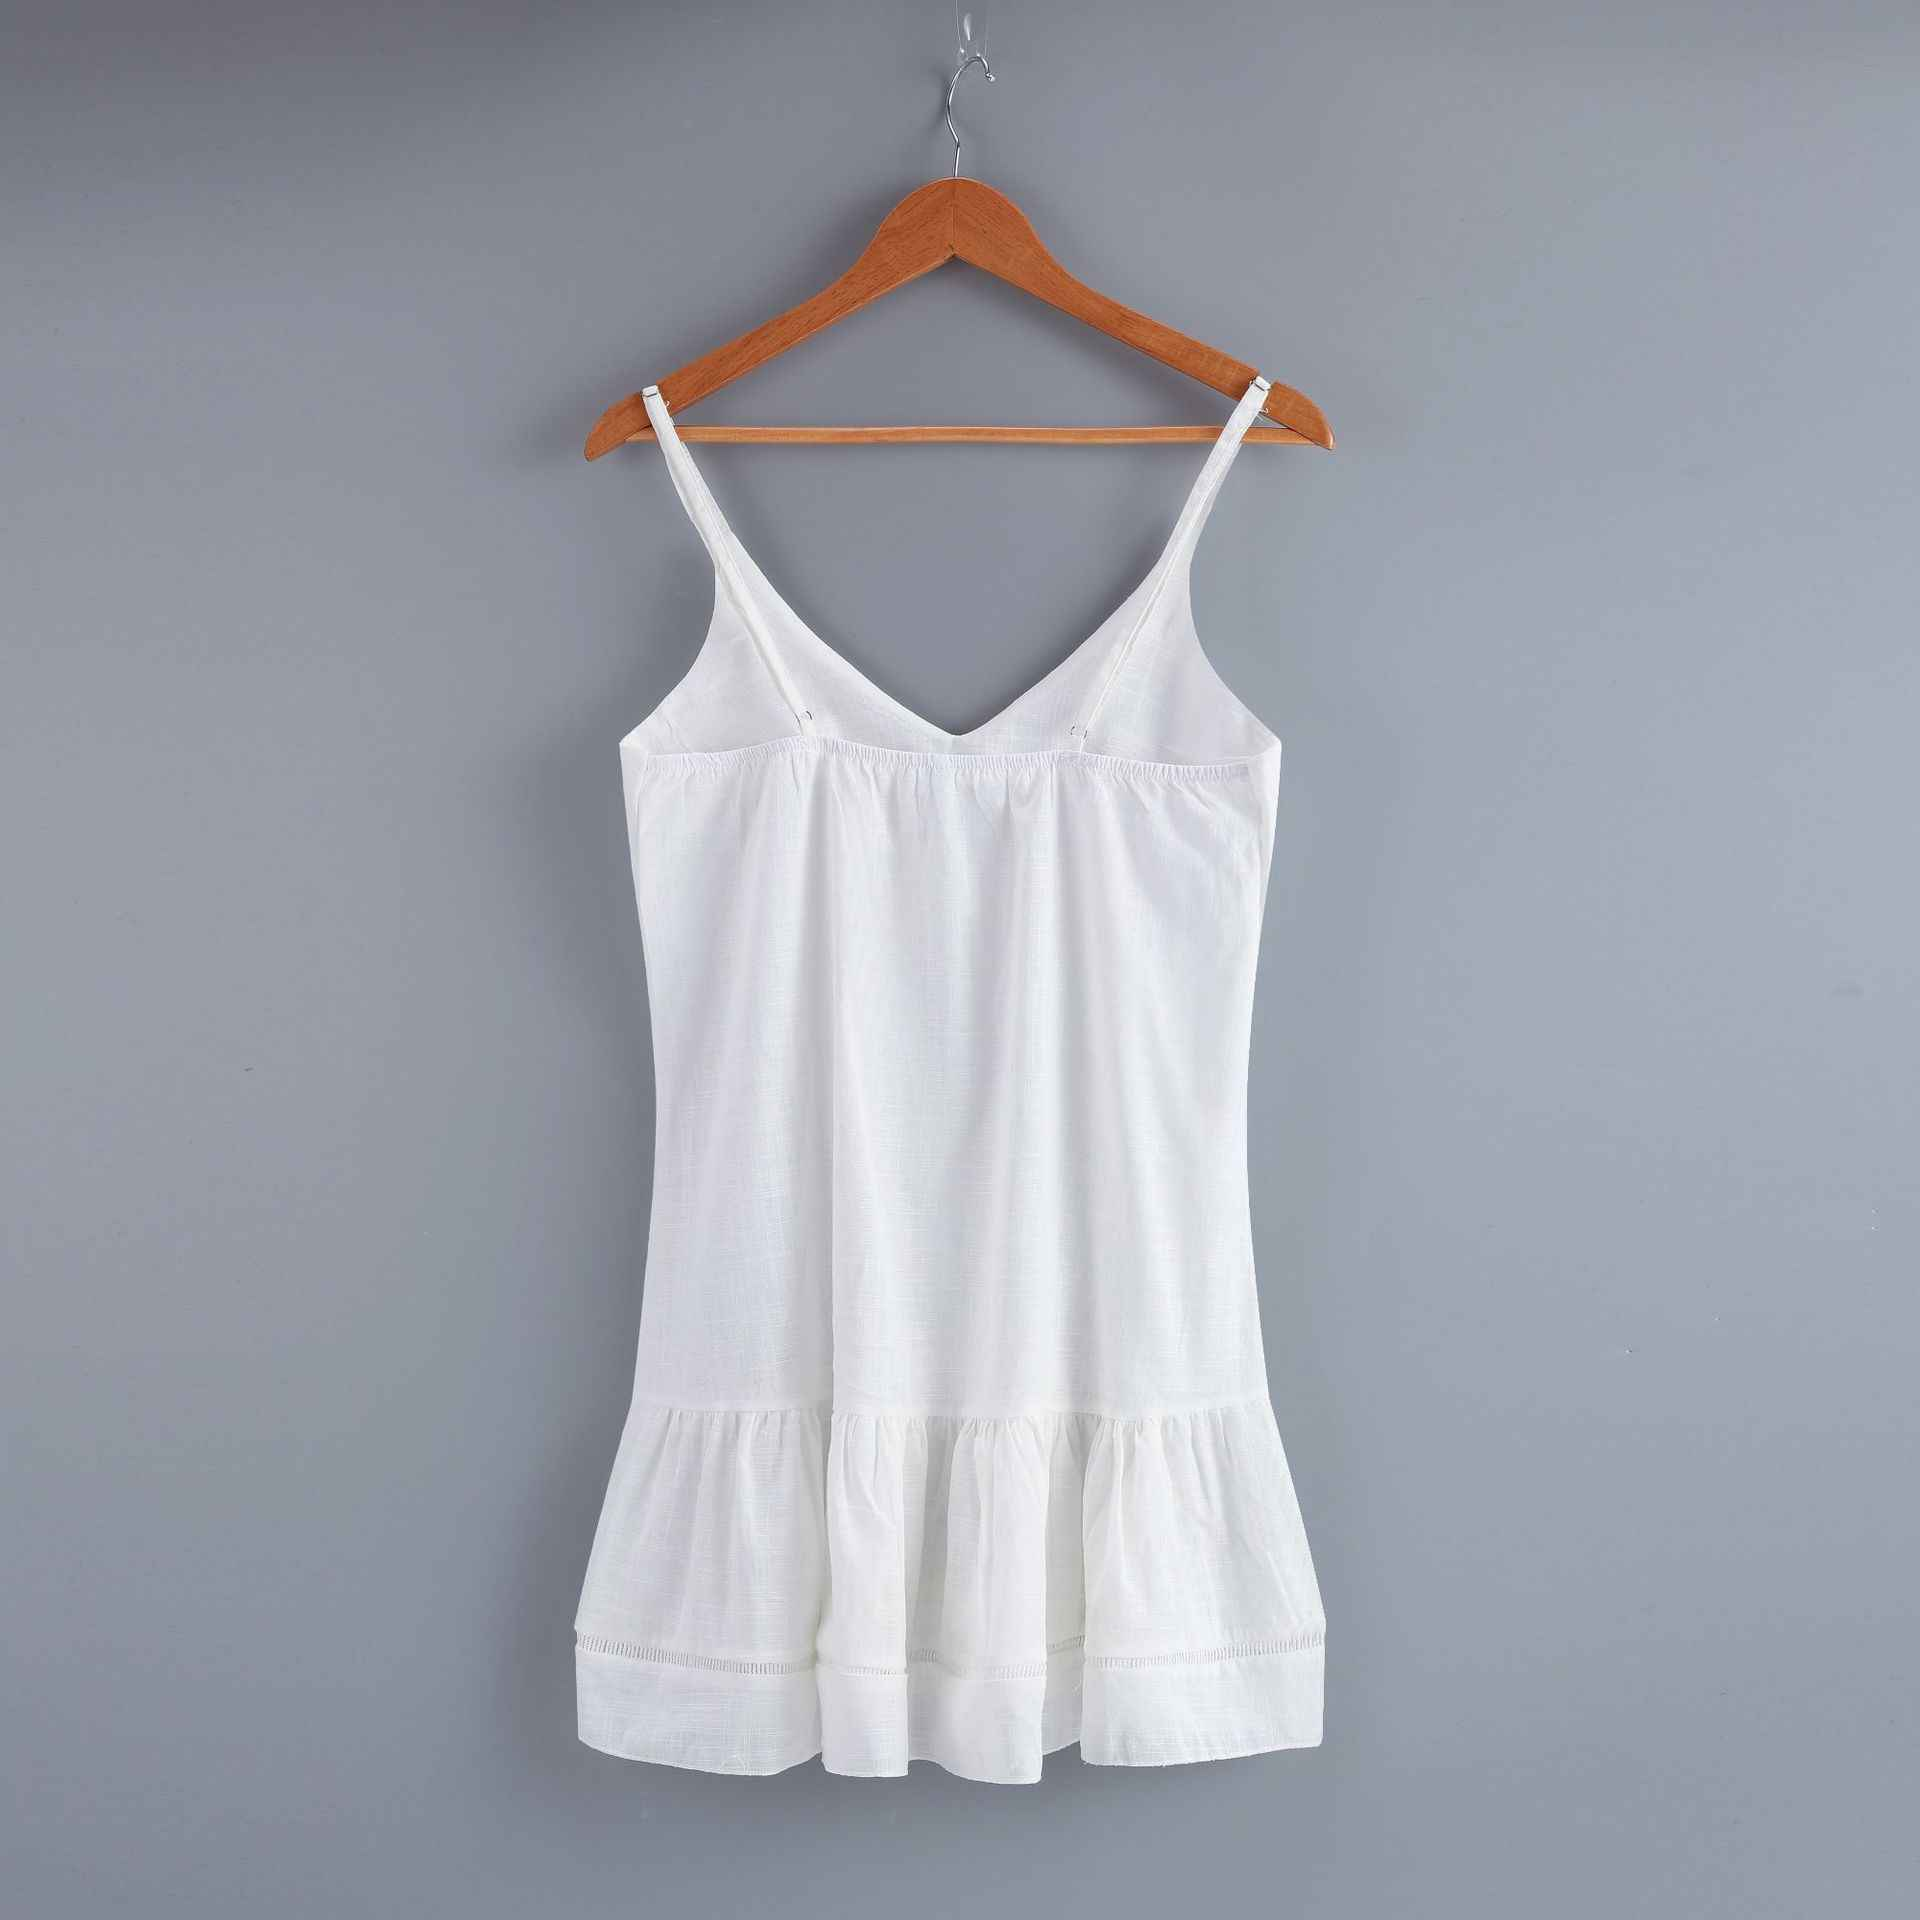 2019 Sexy blanc profond col en V hors épaule licou à volants Mini robe femmes robe moulante robe blanche tenue de club